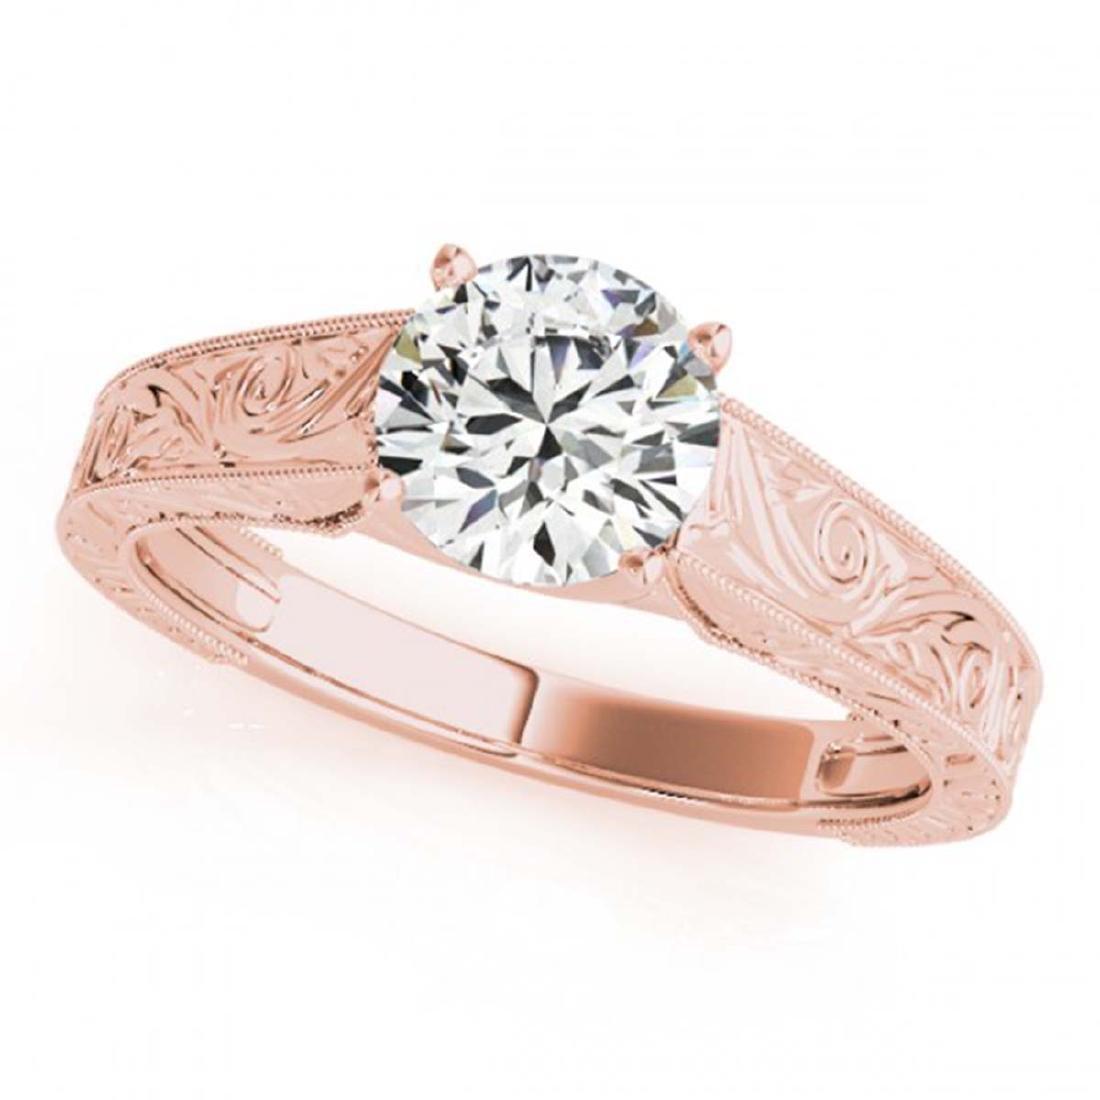 0.75 ctw VS/SI Diamond Ring 18K Rose Gold - REF-135K5W